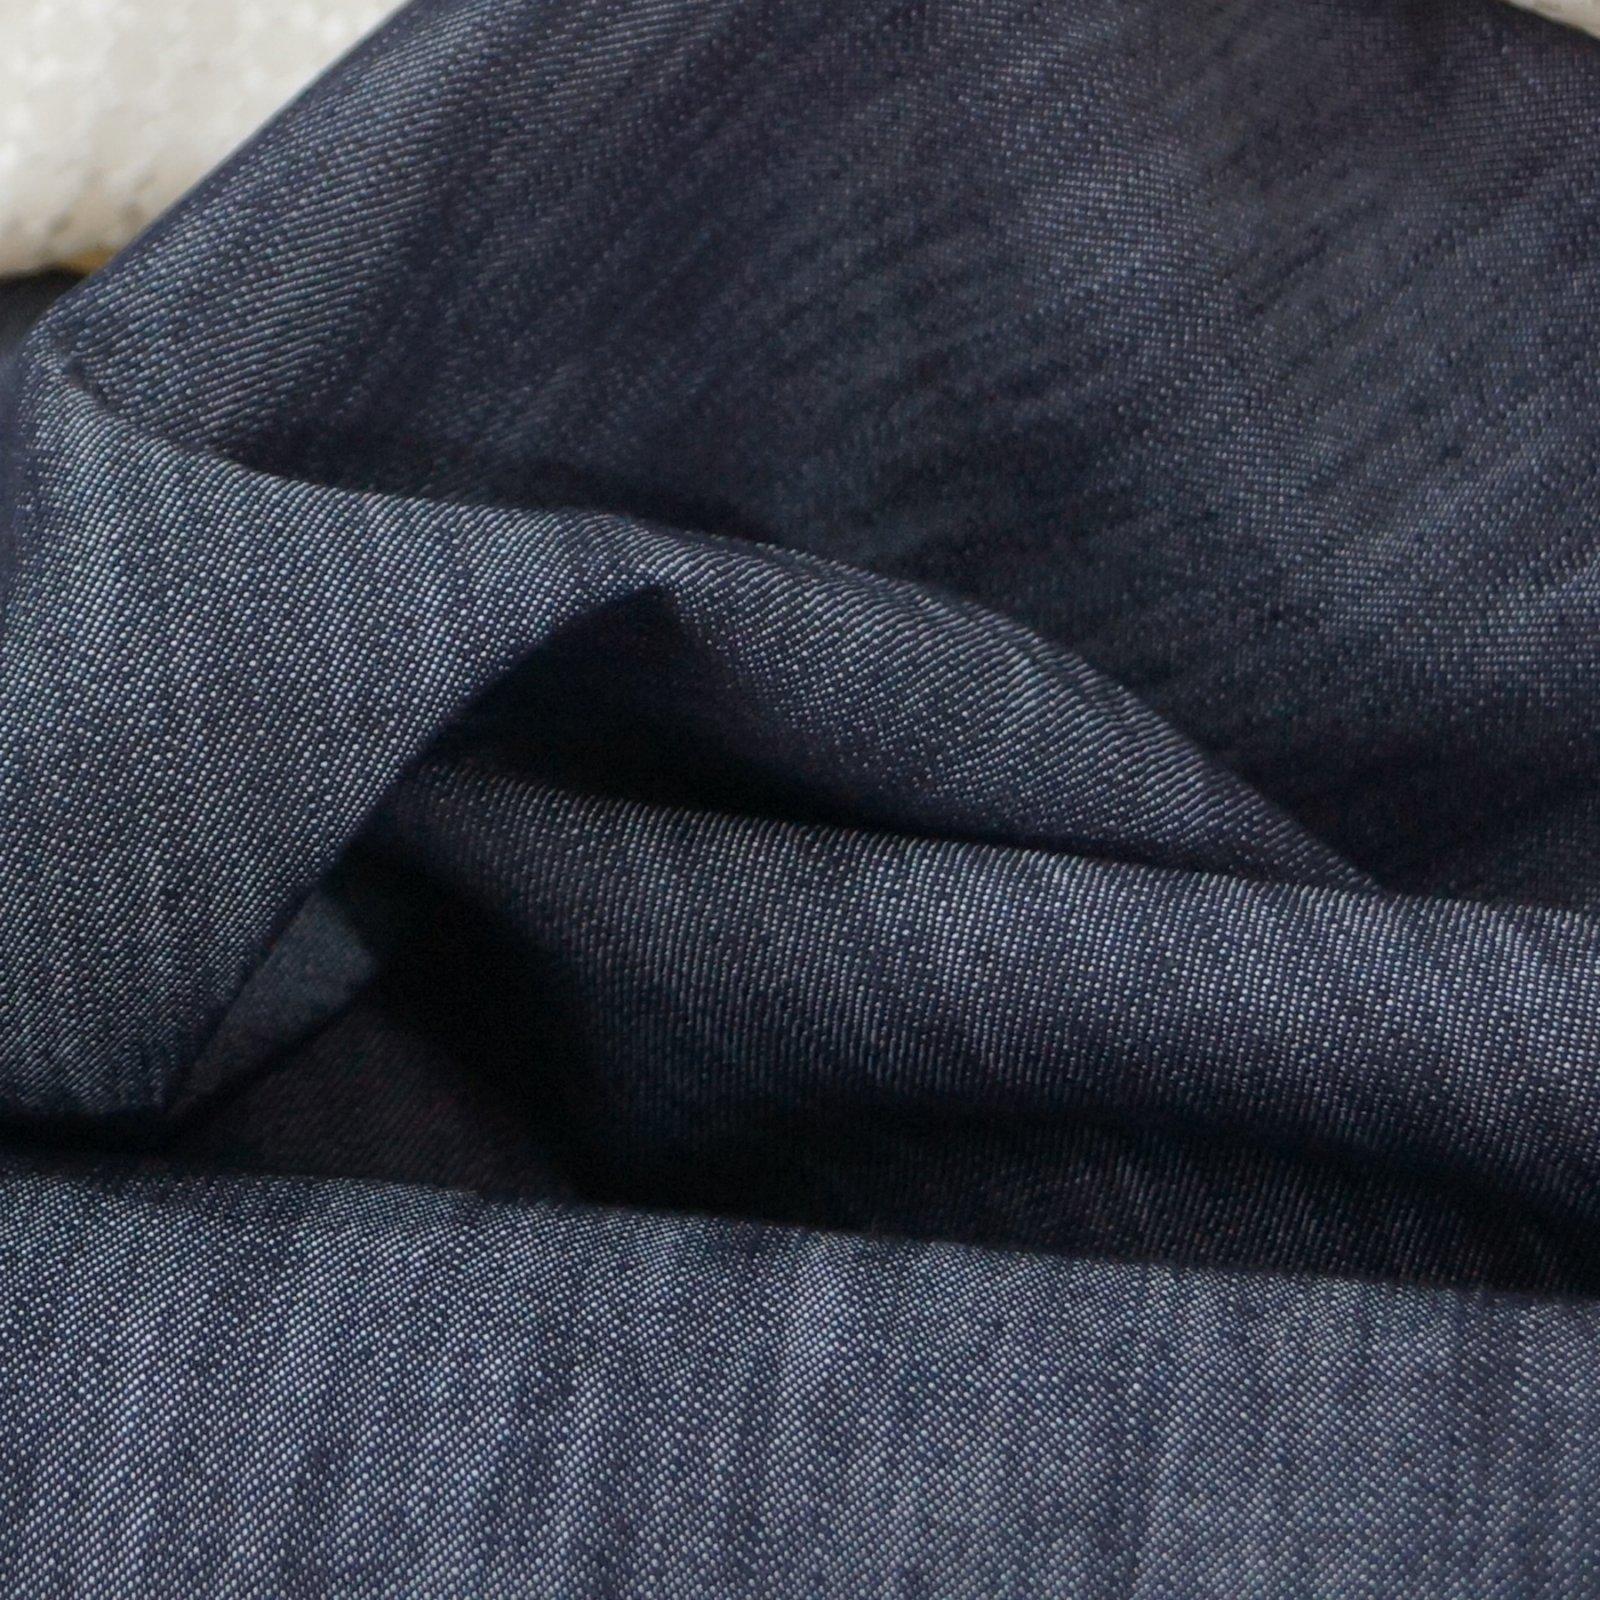 Tencel/Cotton Twill - Dark Indigo